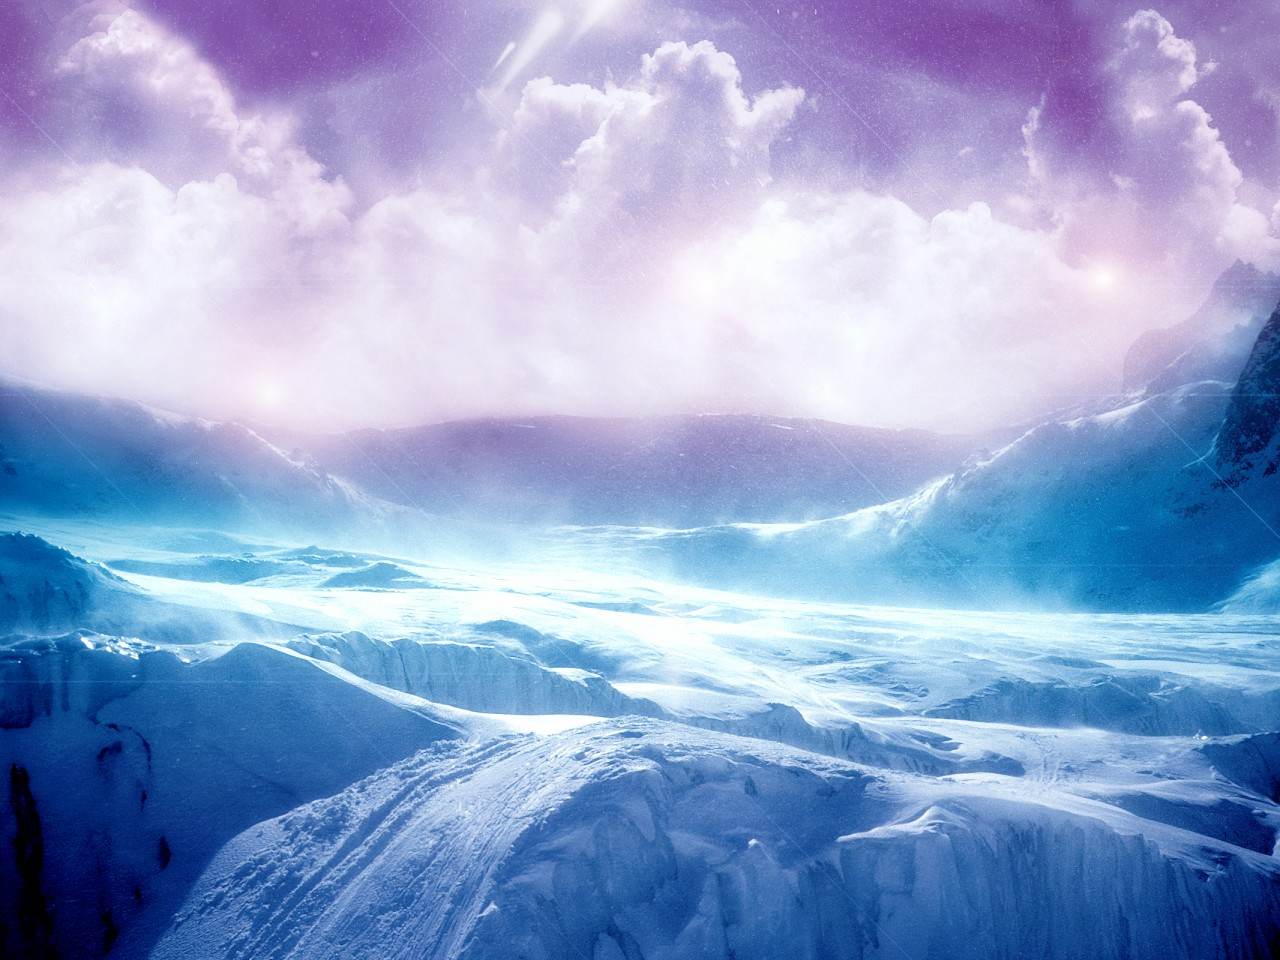 High Resolution Ice Terrain Wallpaper